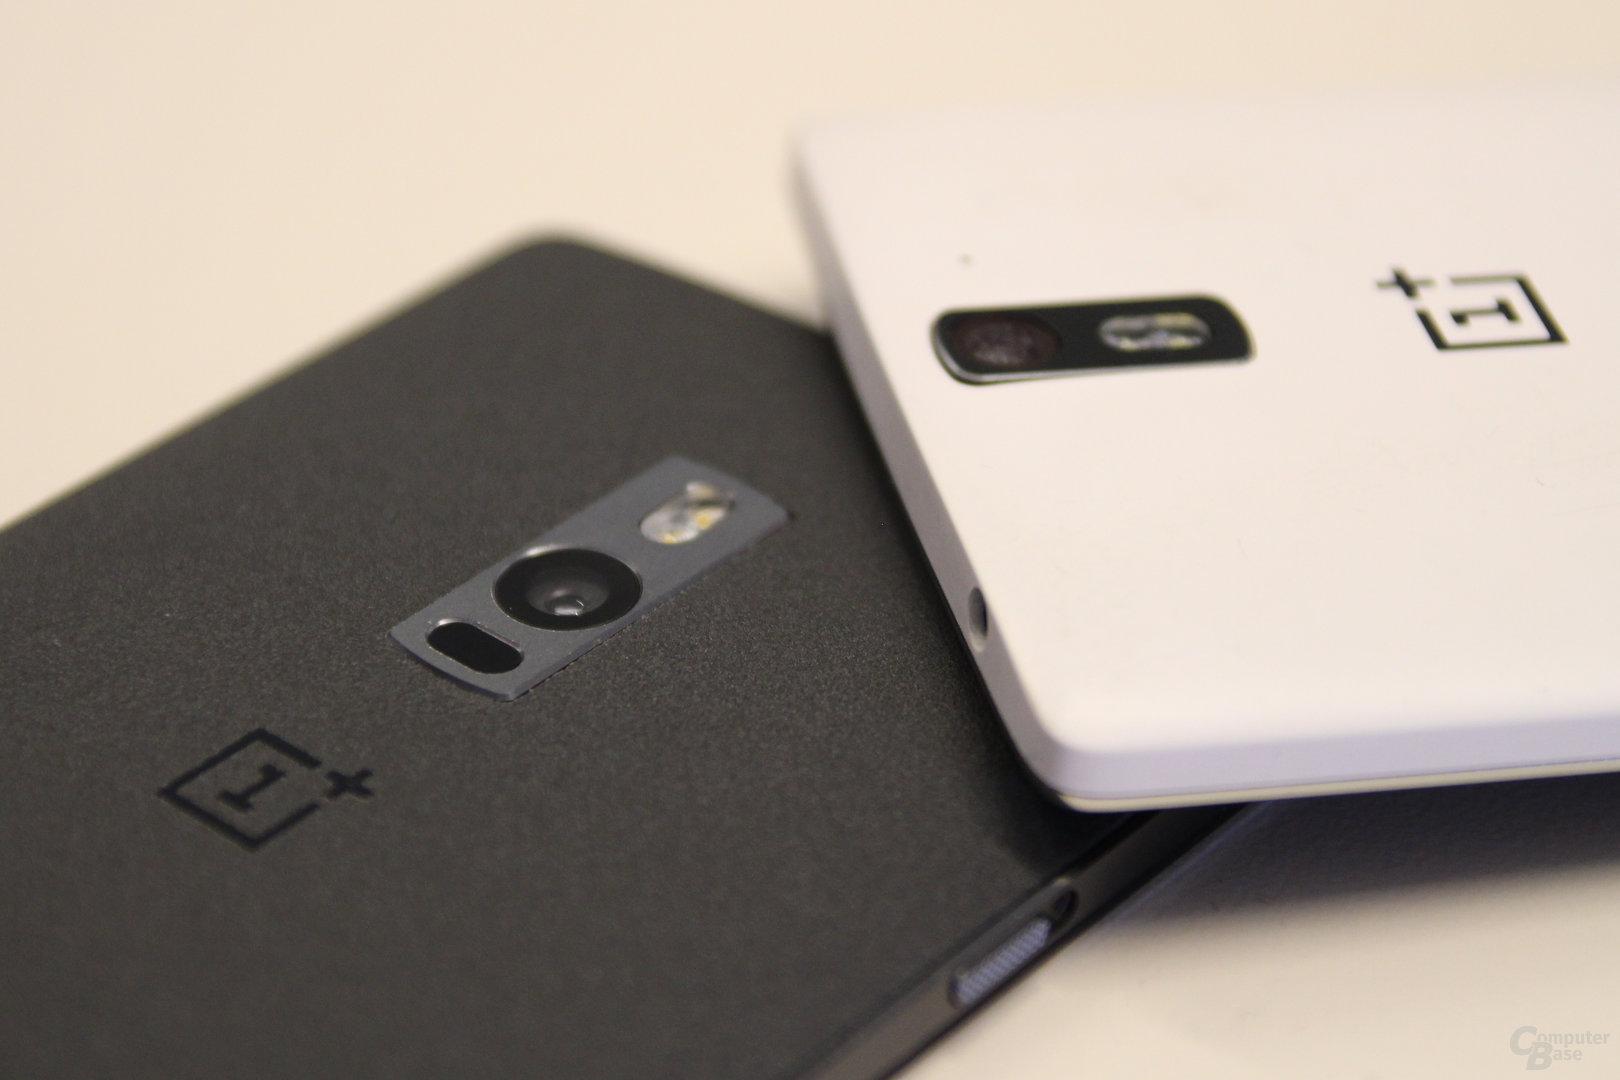 OnePlus 2 neben dem OnePlus One